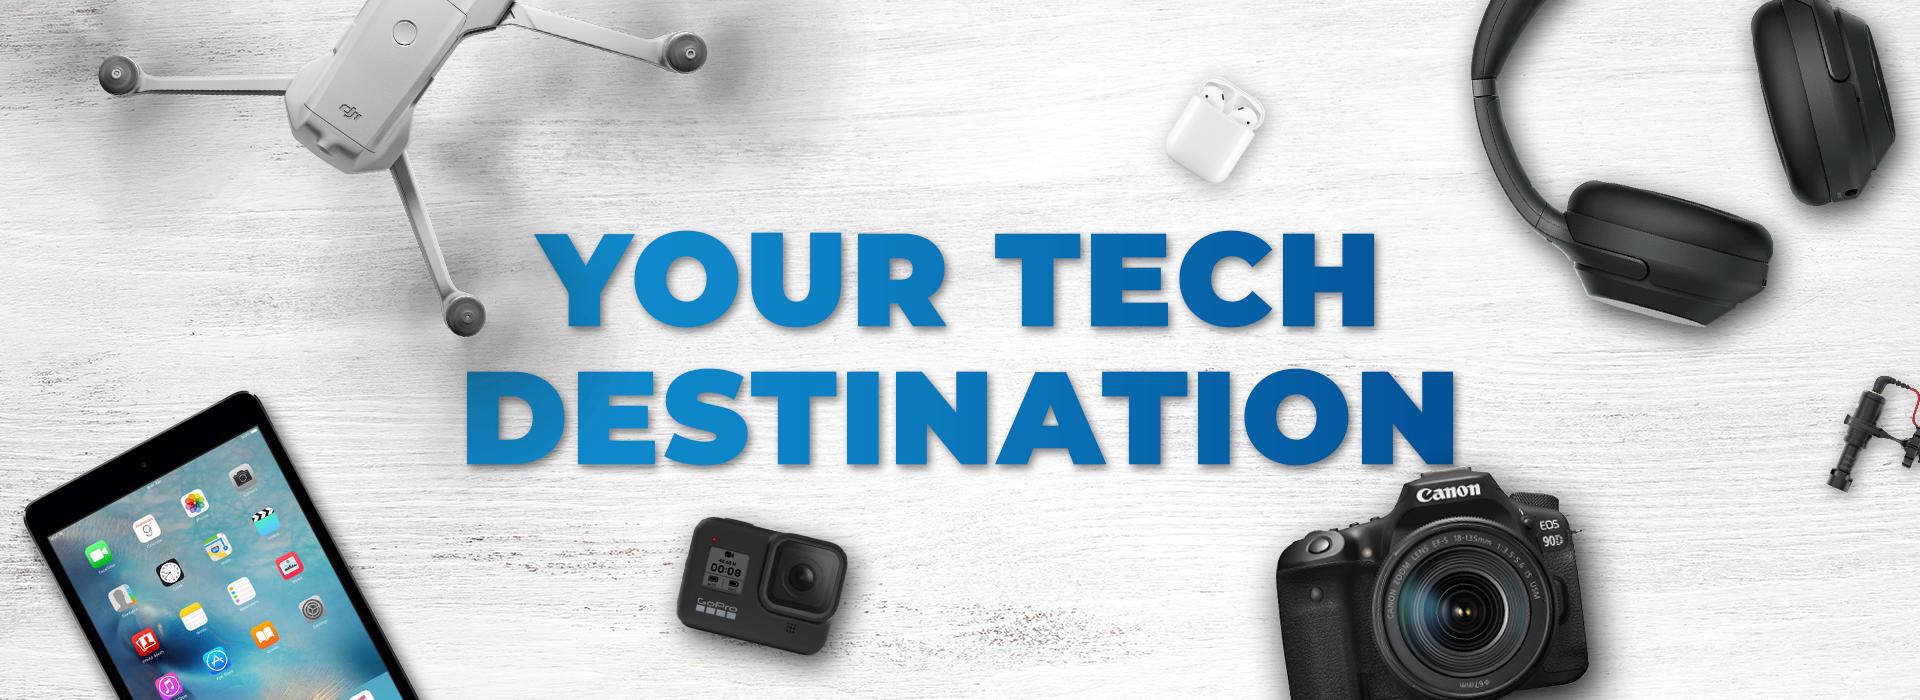 Tech Destination